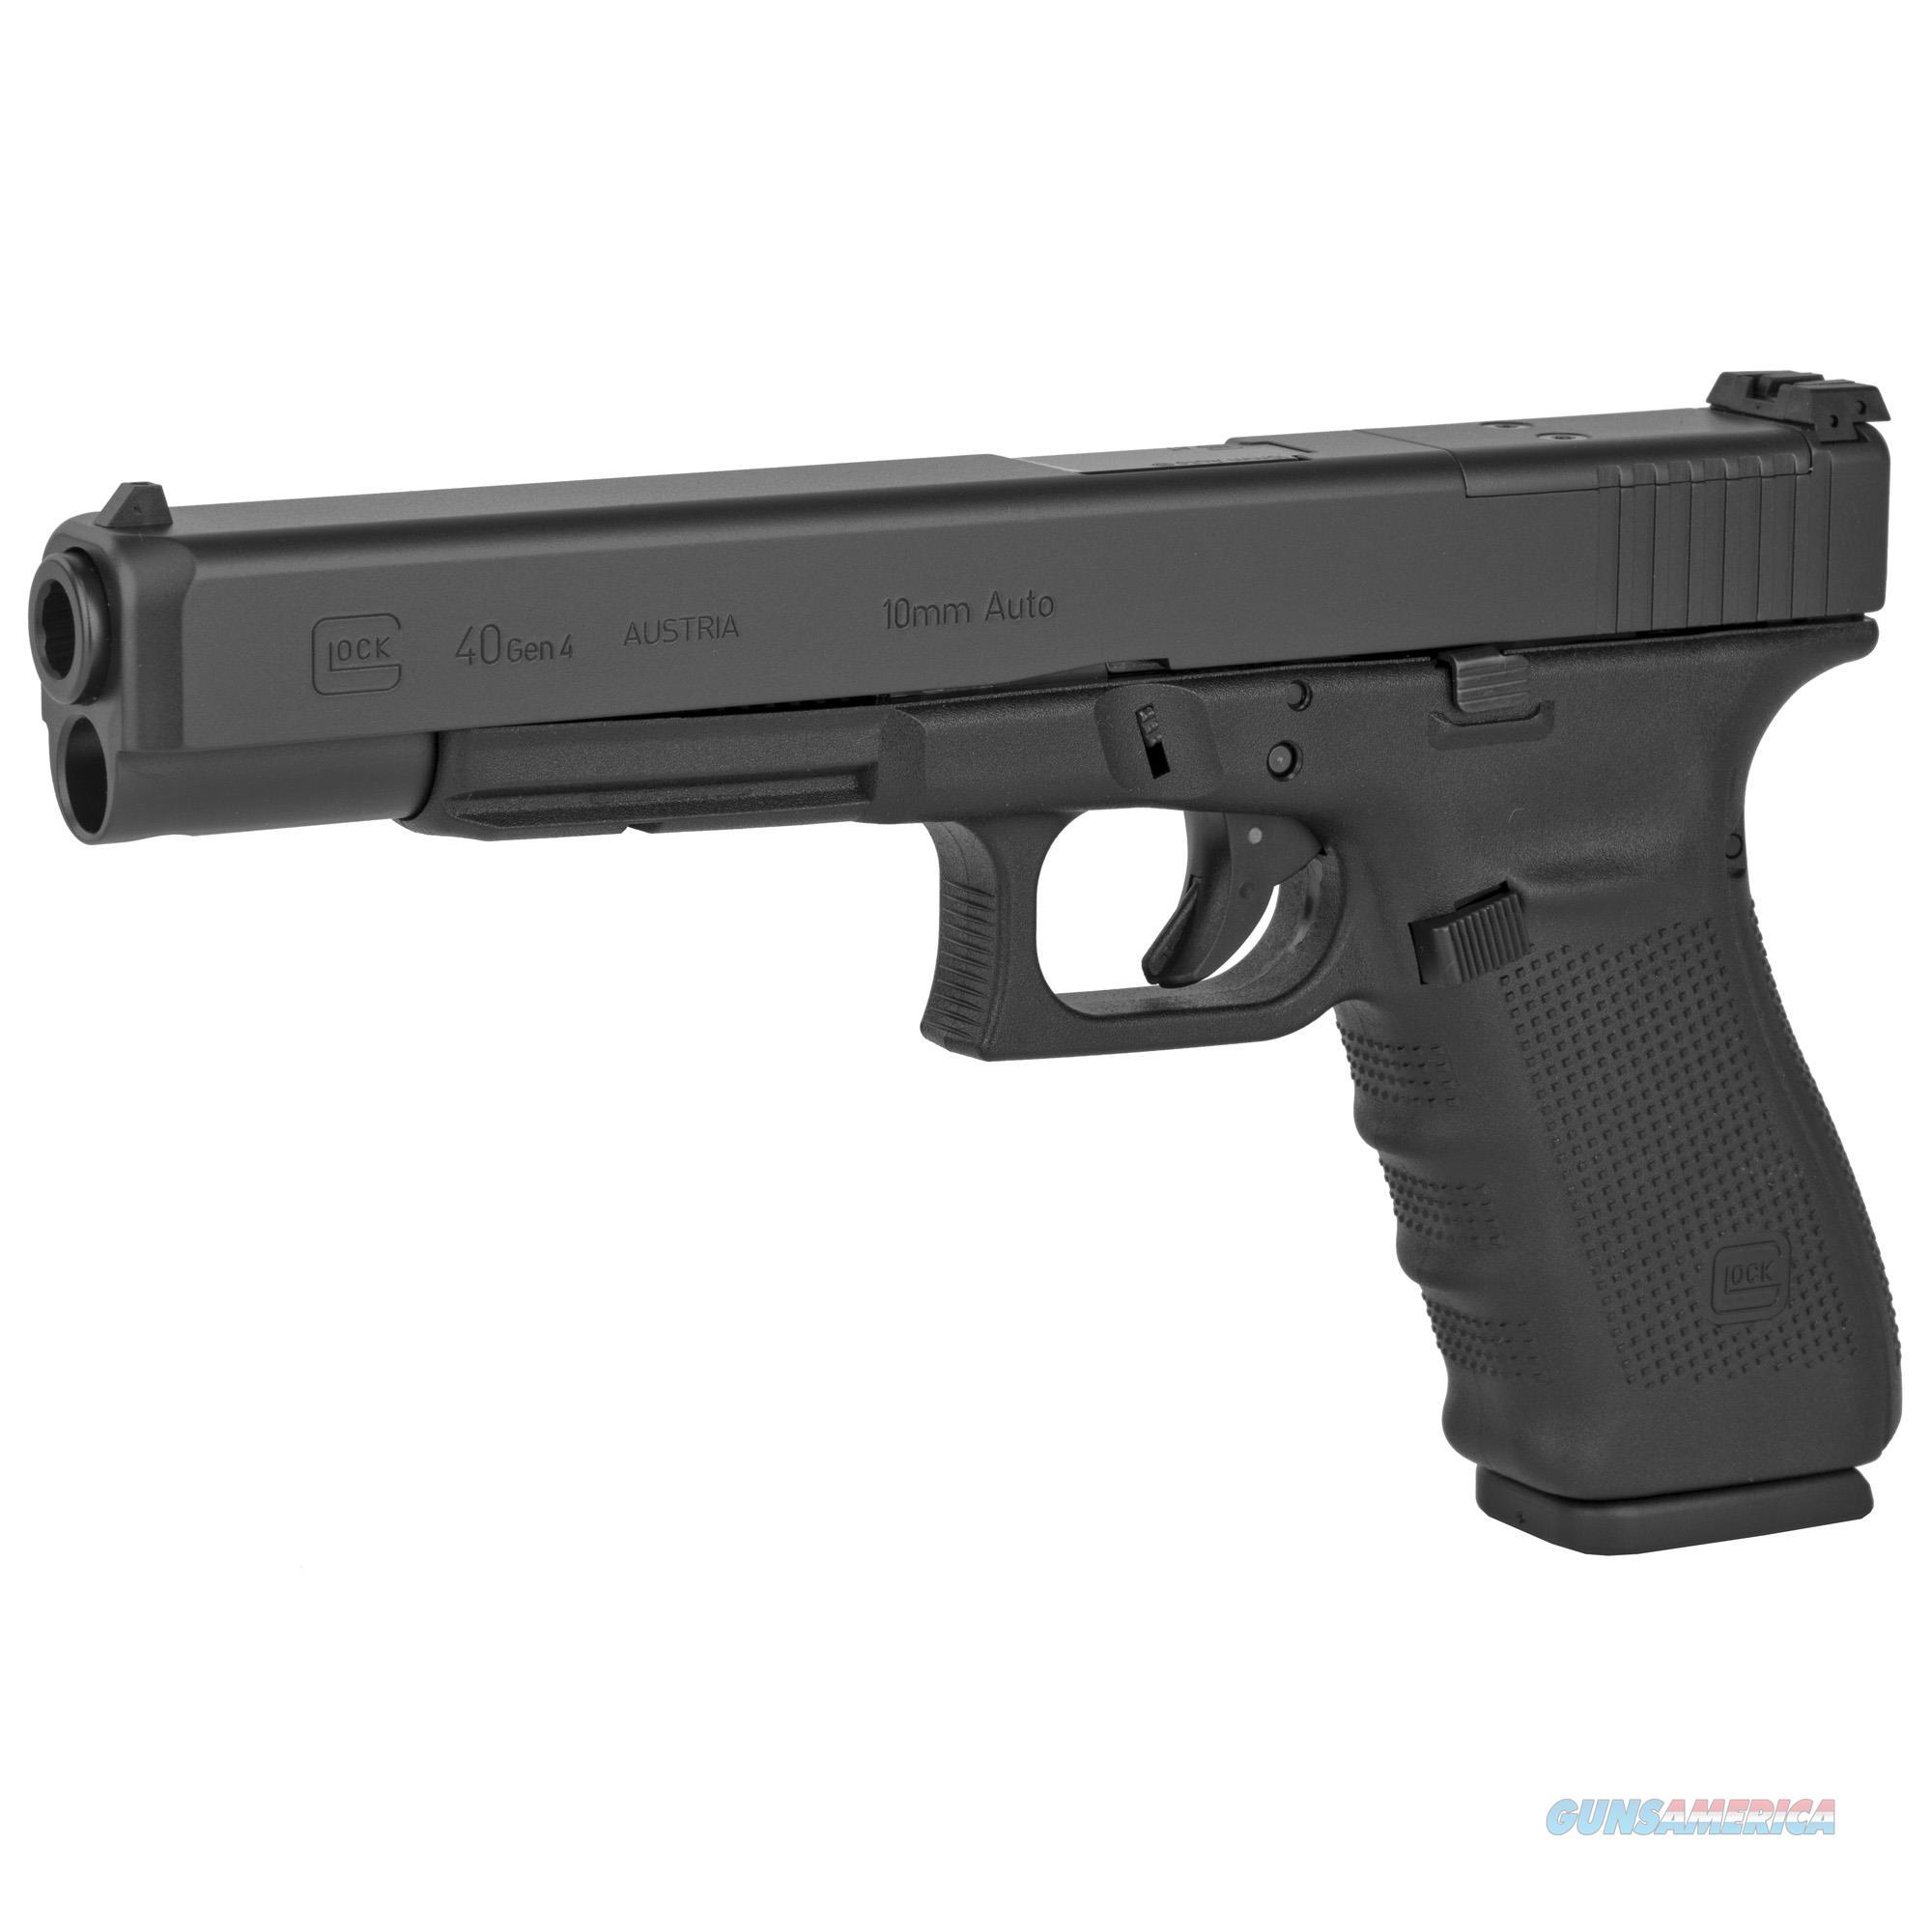 "Glock G40 Gen4 MOS 10mm 6.02"" 15+1 - New in Case!  Guns > Pistols > Glock Pistols > 40"